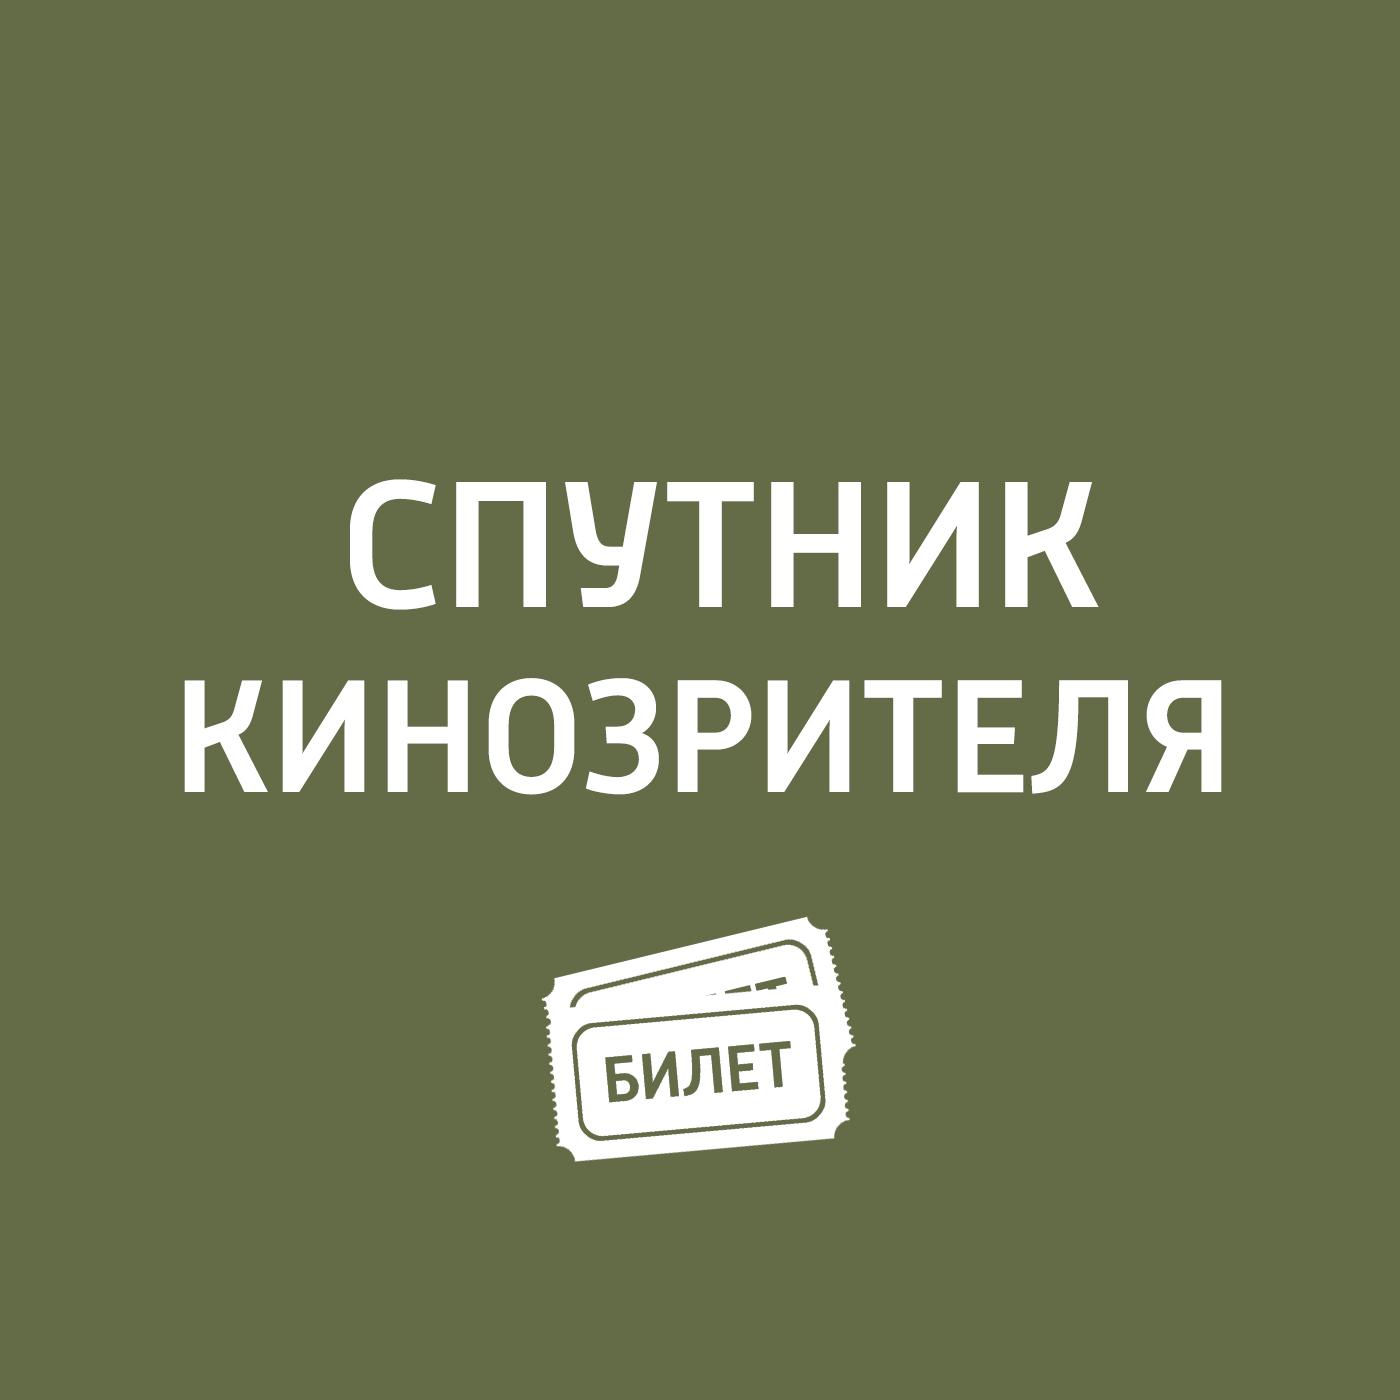 Антон Долин Война миров Z, «Пена дней мачете двустороннее truper длина лезвия 45 72 см